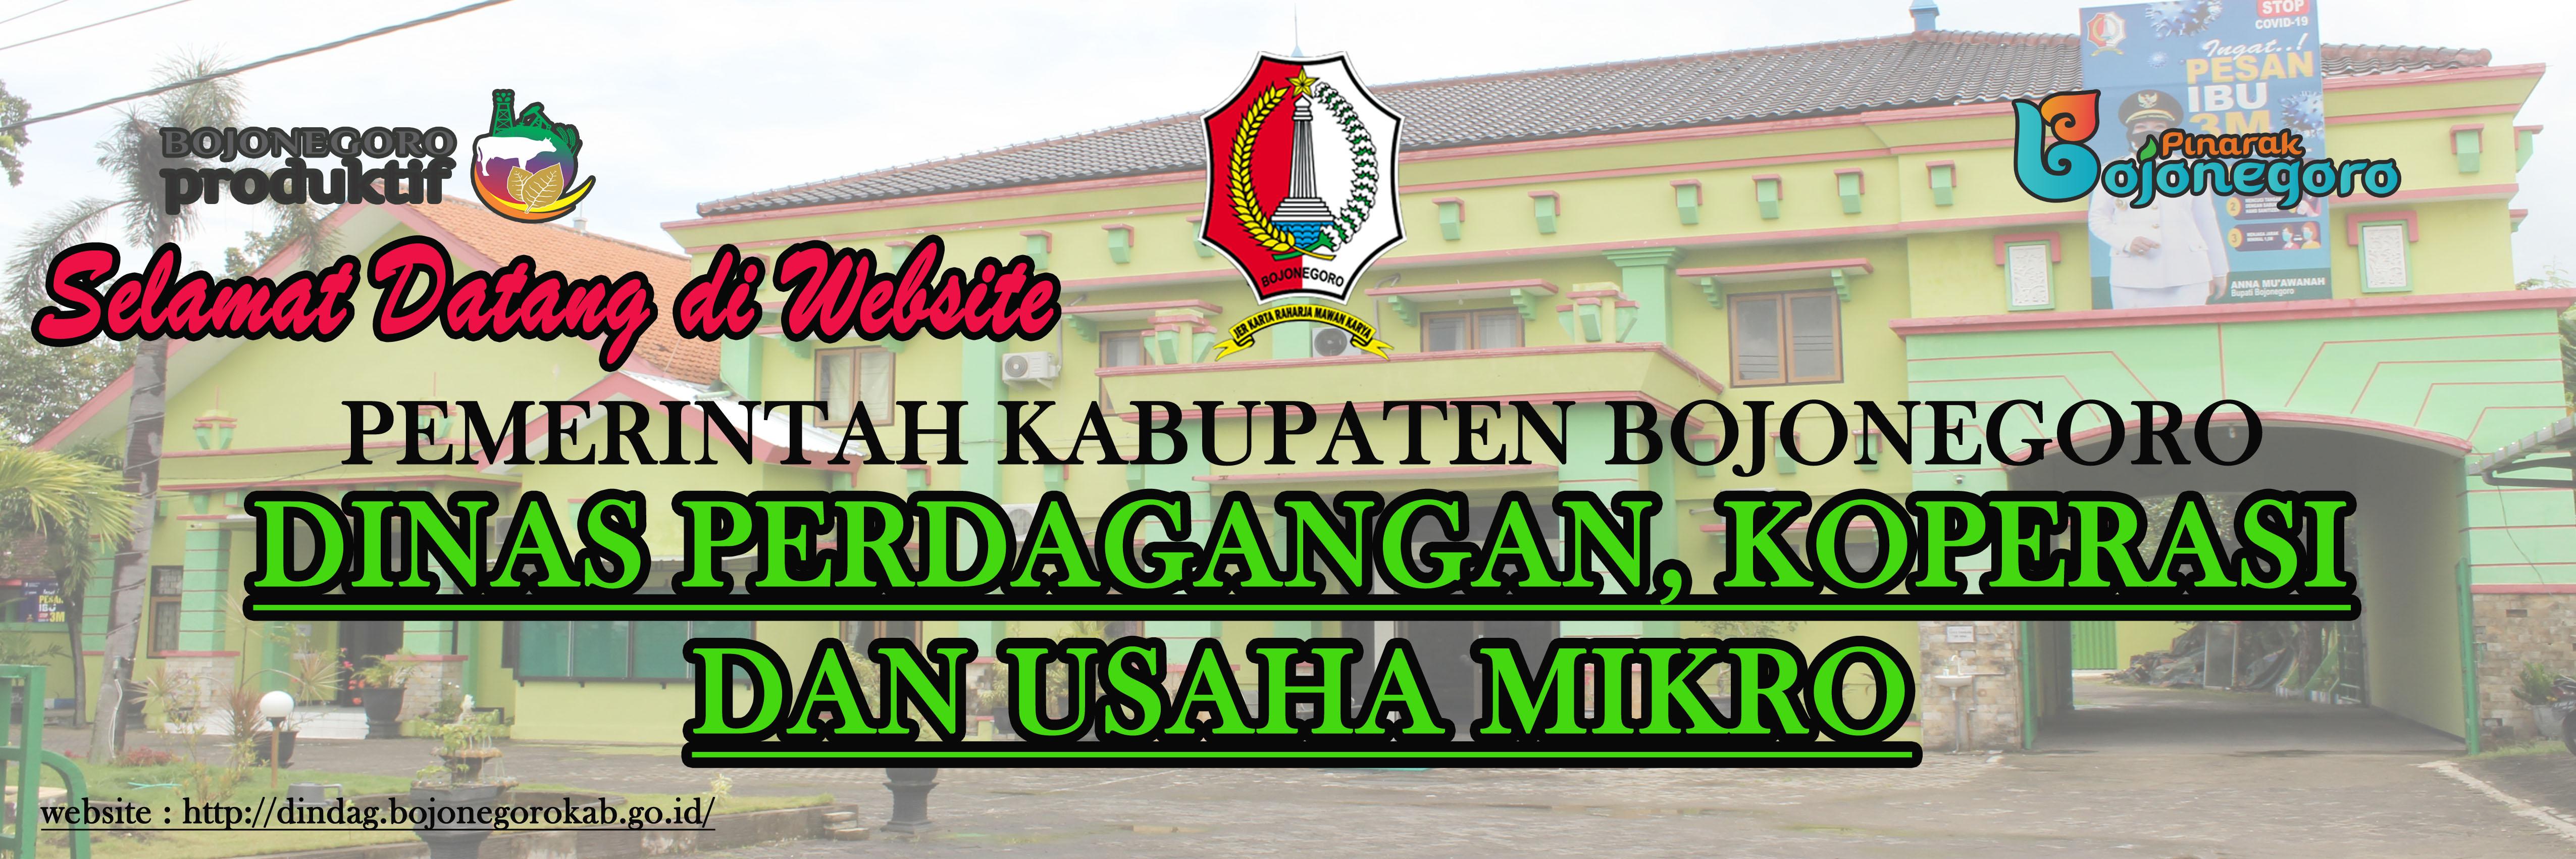 Dinas Perdagangan, Koperasi dan Usaha Mikro<BR>Kabupaten Bojonegoro